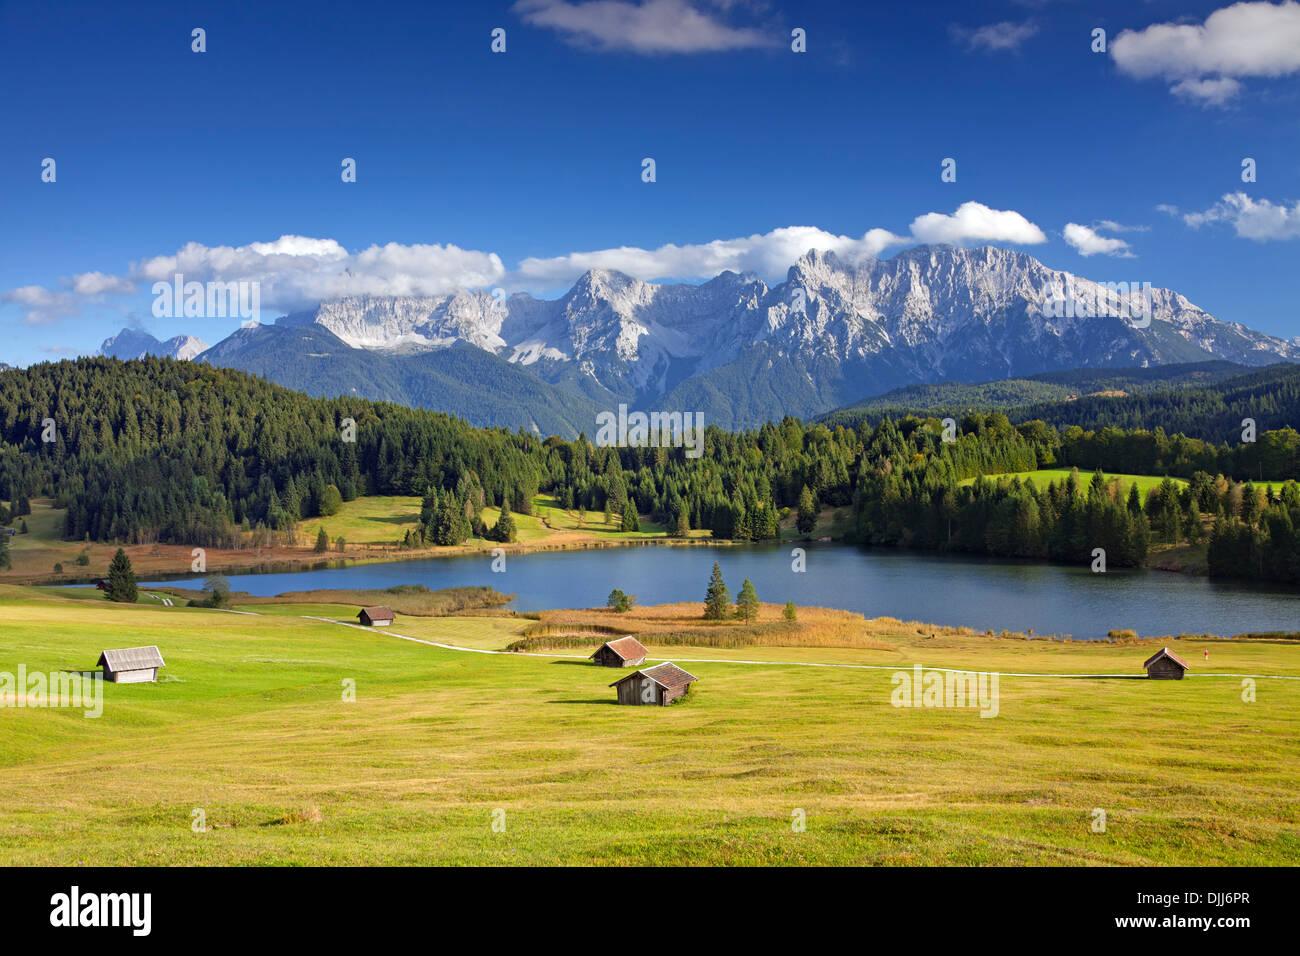 The Karwendel Mountain Range and huts along lake Gerold / Geroldsee near Mittenwald, Upper Bavaria, Germany - Stock Image